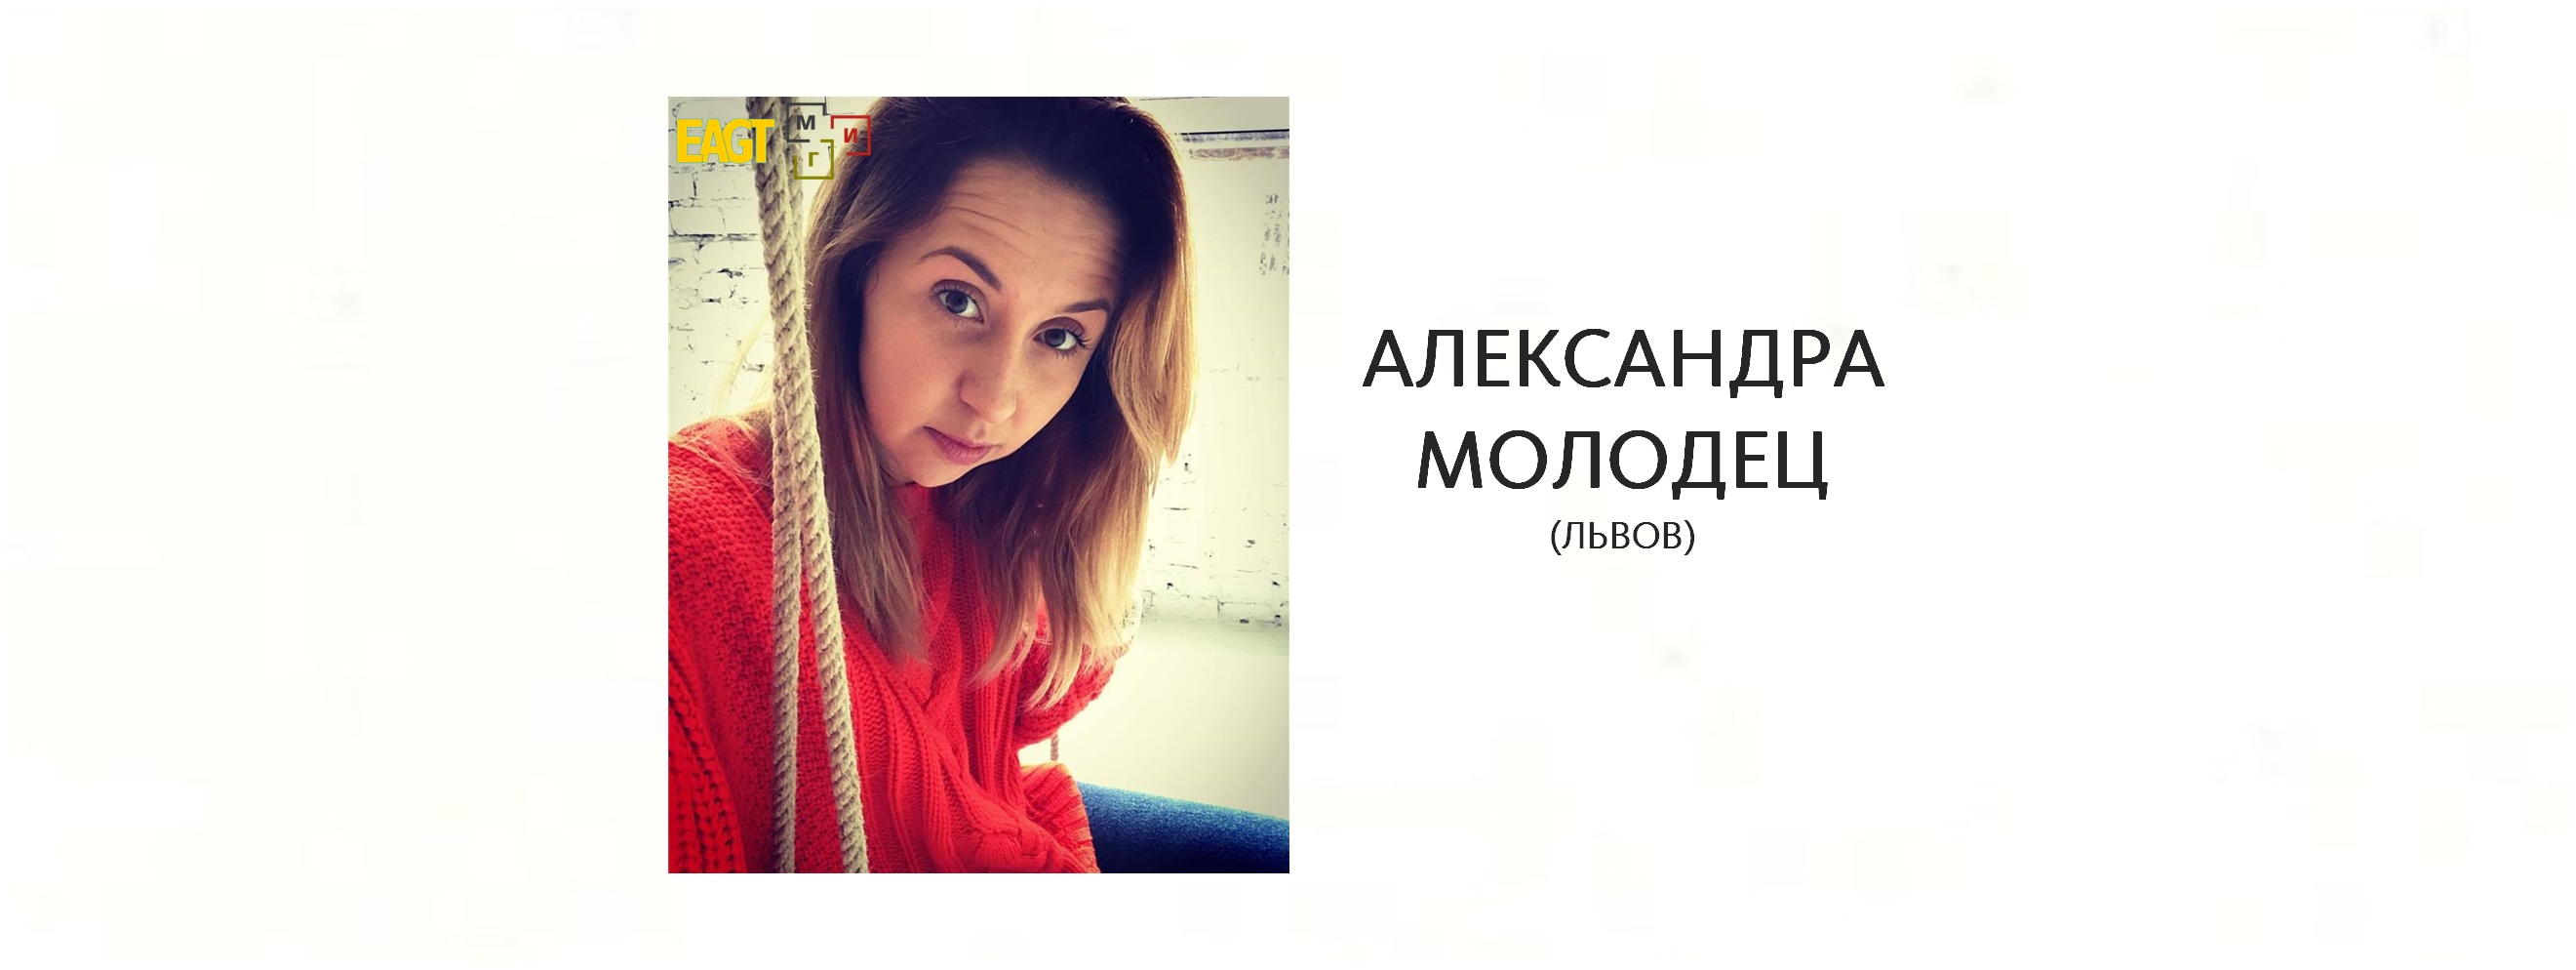 Александра Молодец